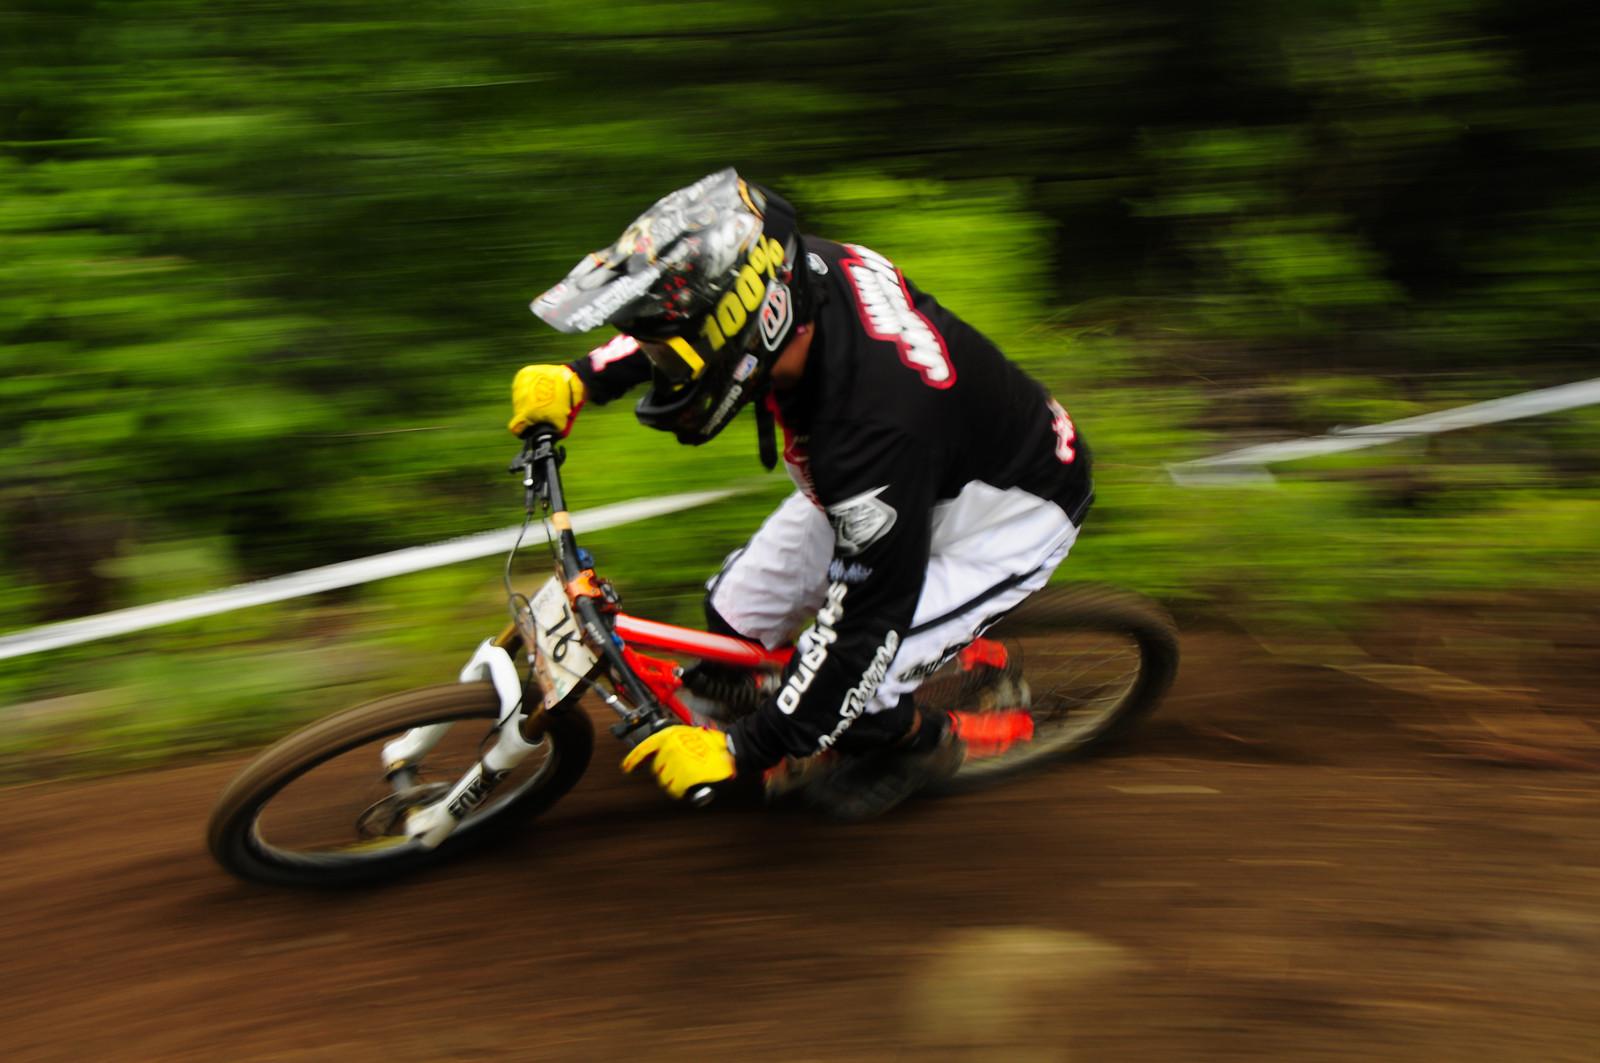 Canadian Open Mario Jarrin - ezefaccio - Mountain Biking Pictures - Vital MTB